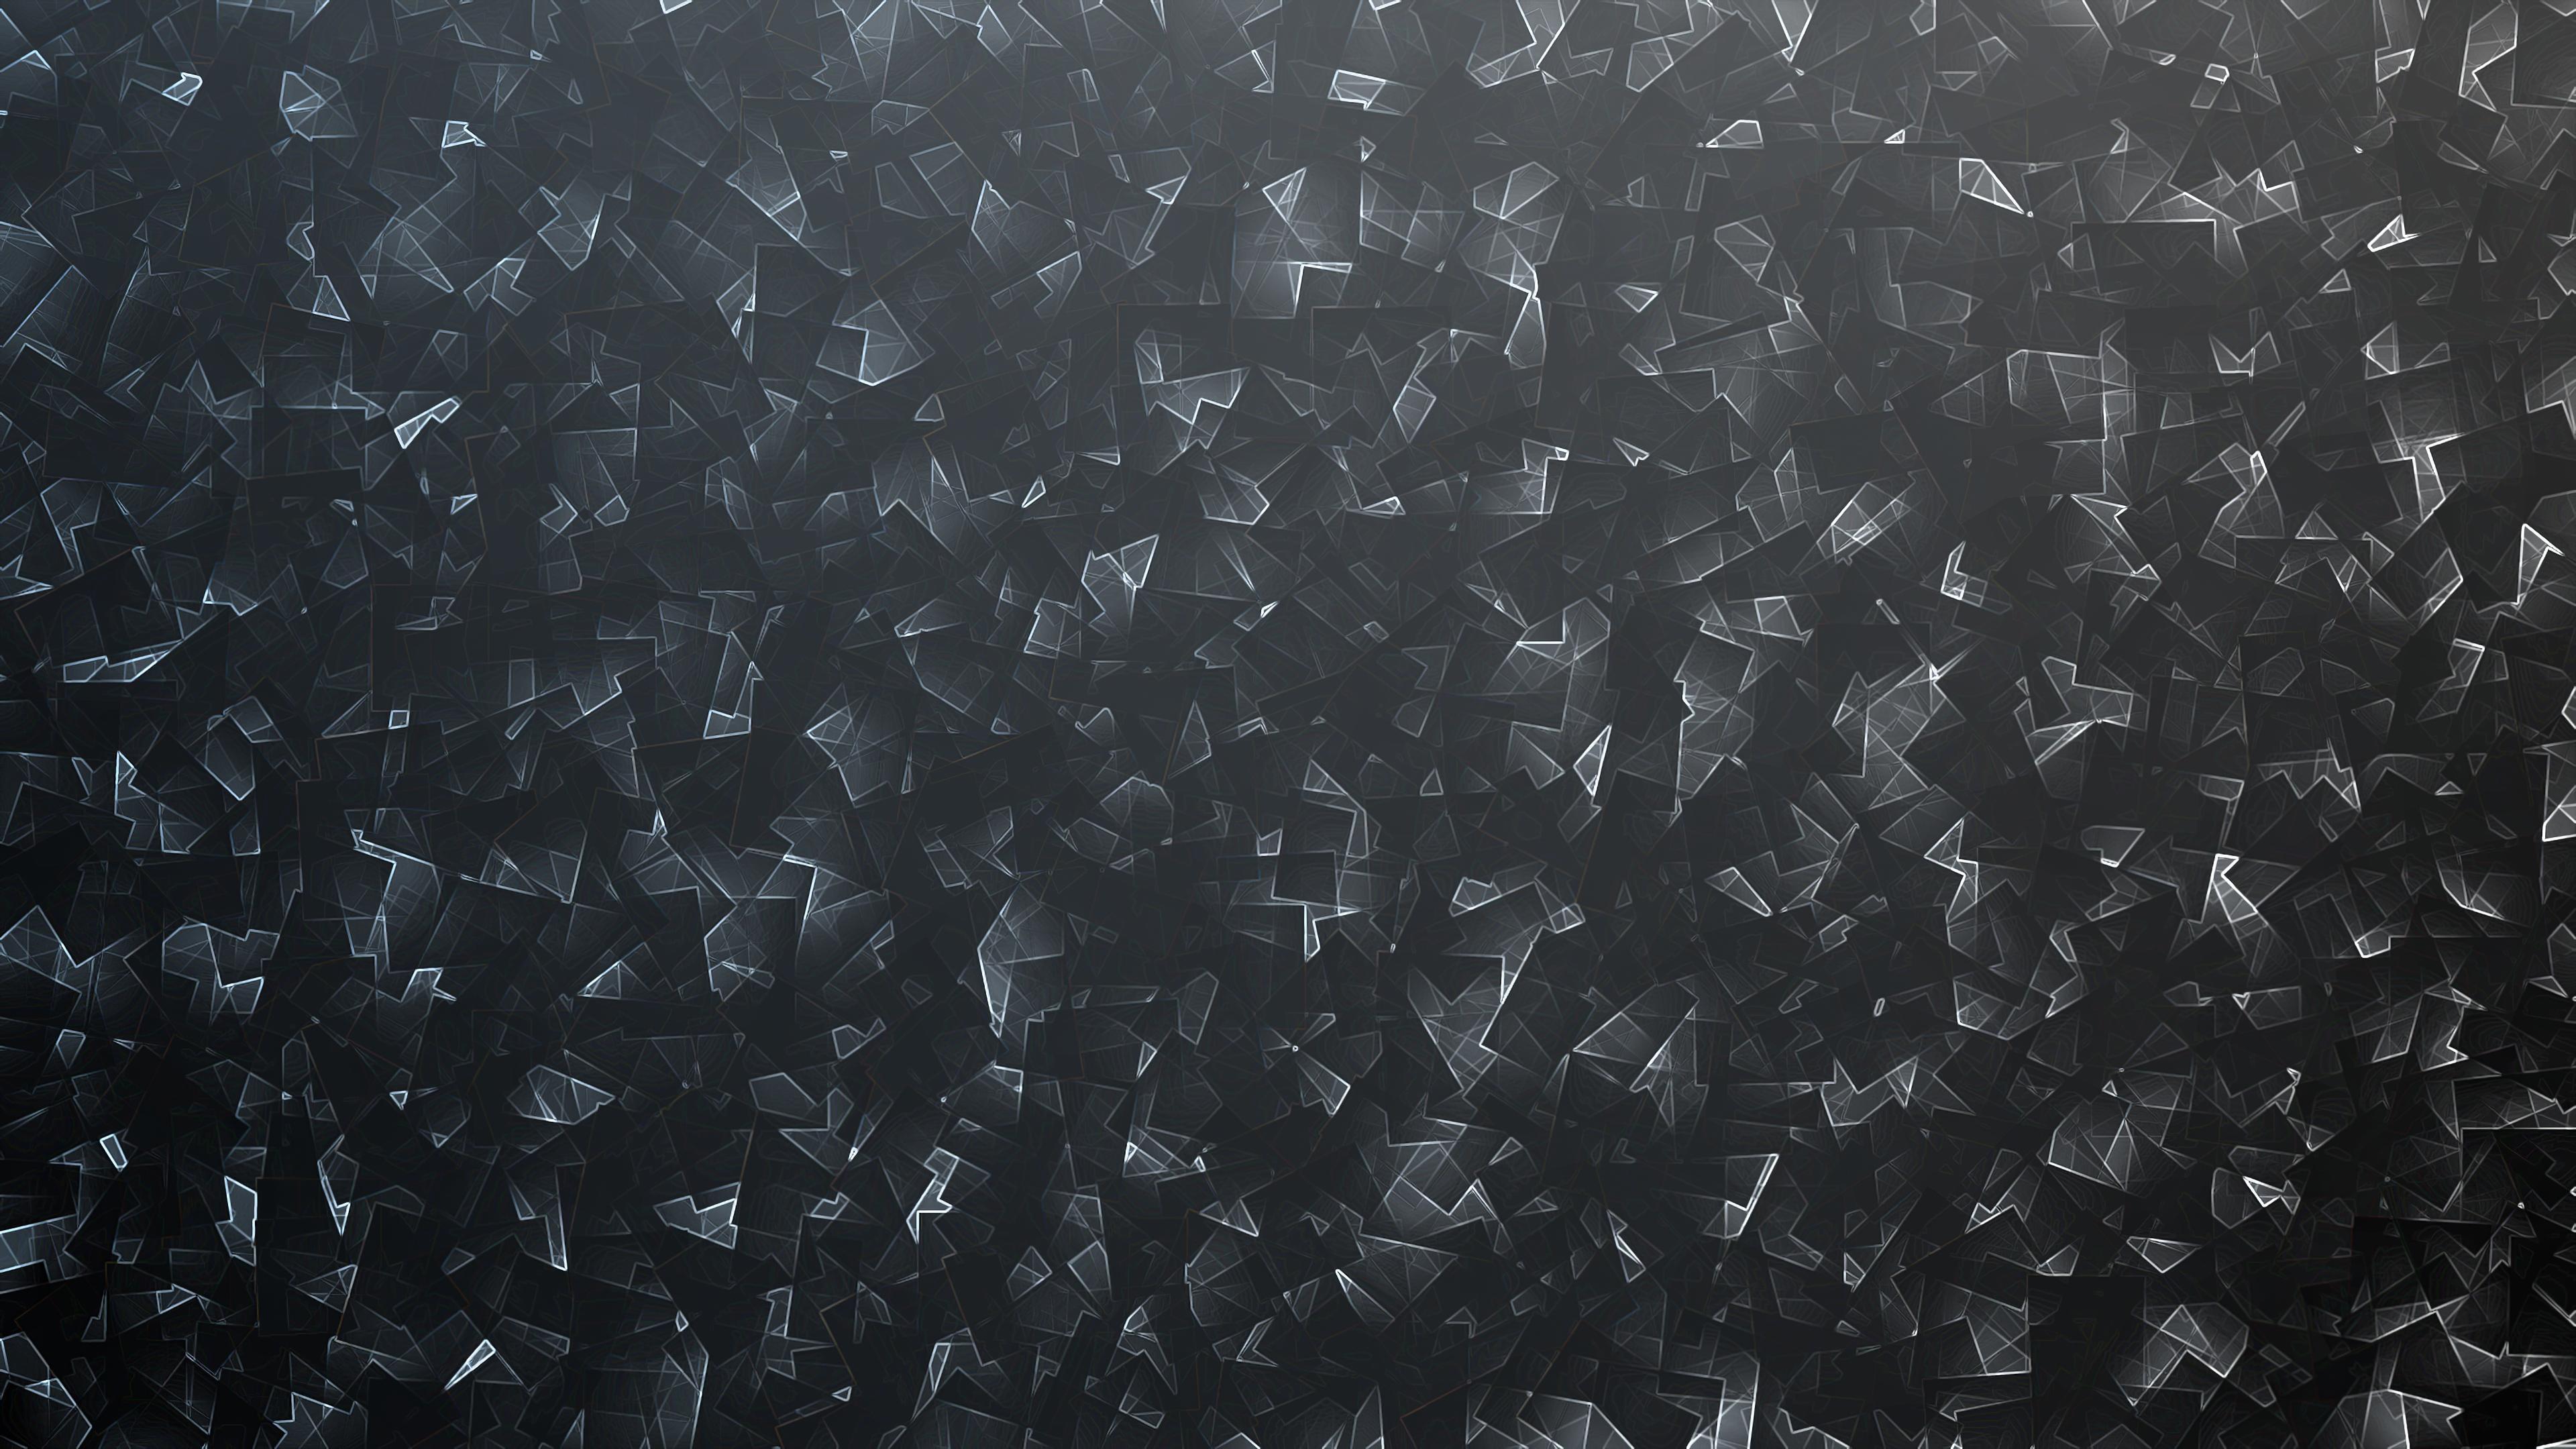 black crystals texture 1575661231 - Black Crystals Texture -